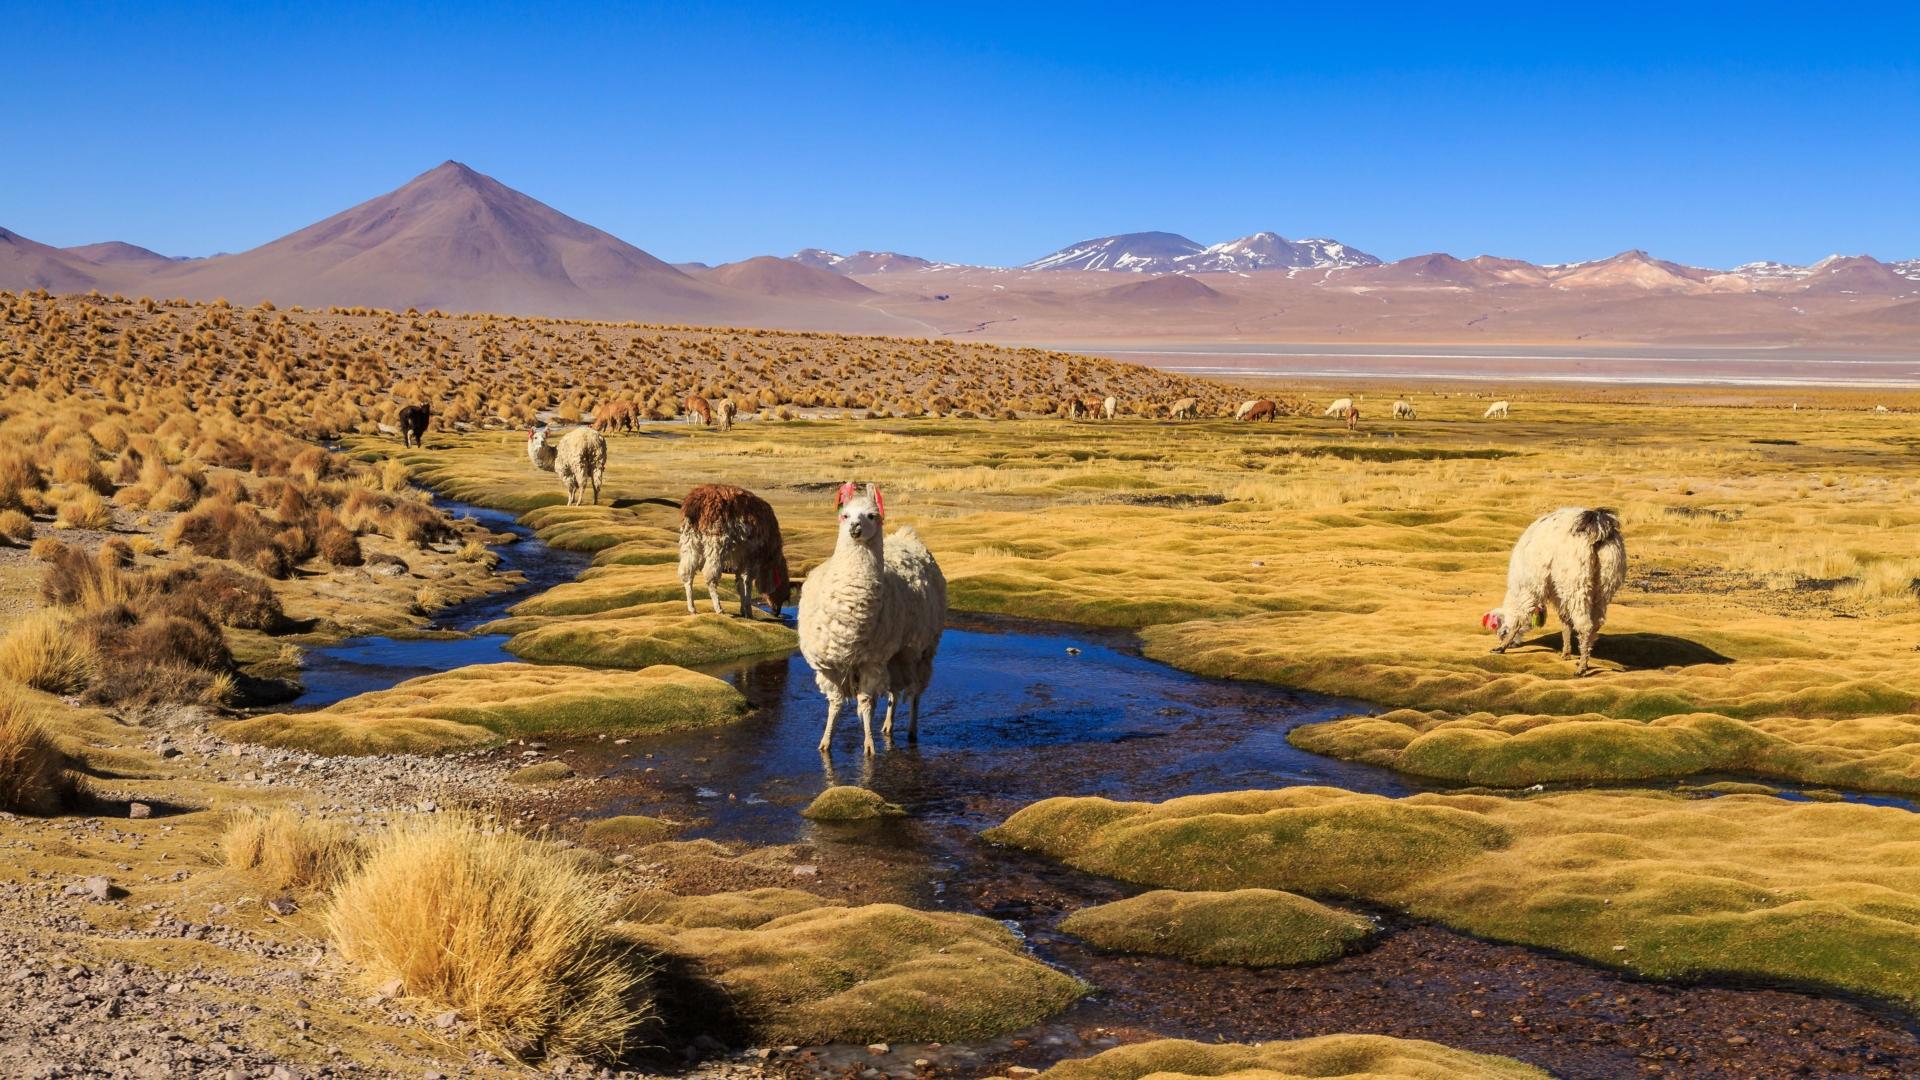 lama-altiplano